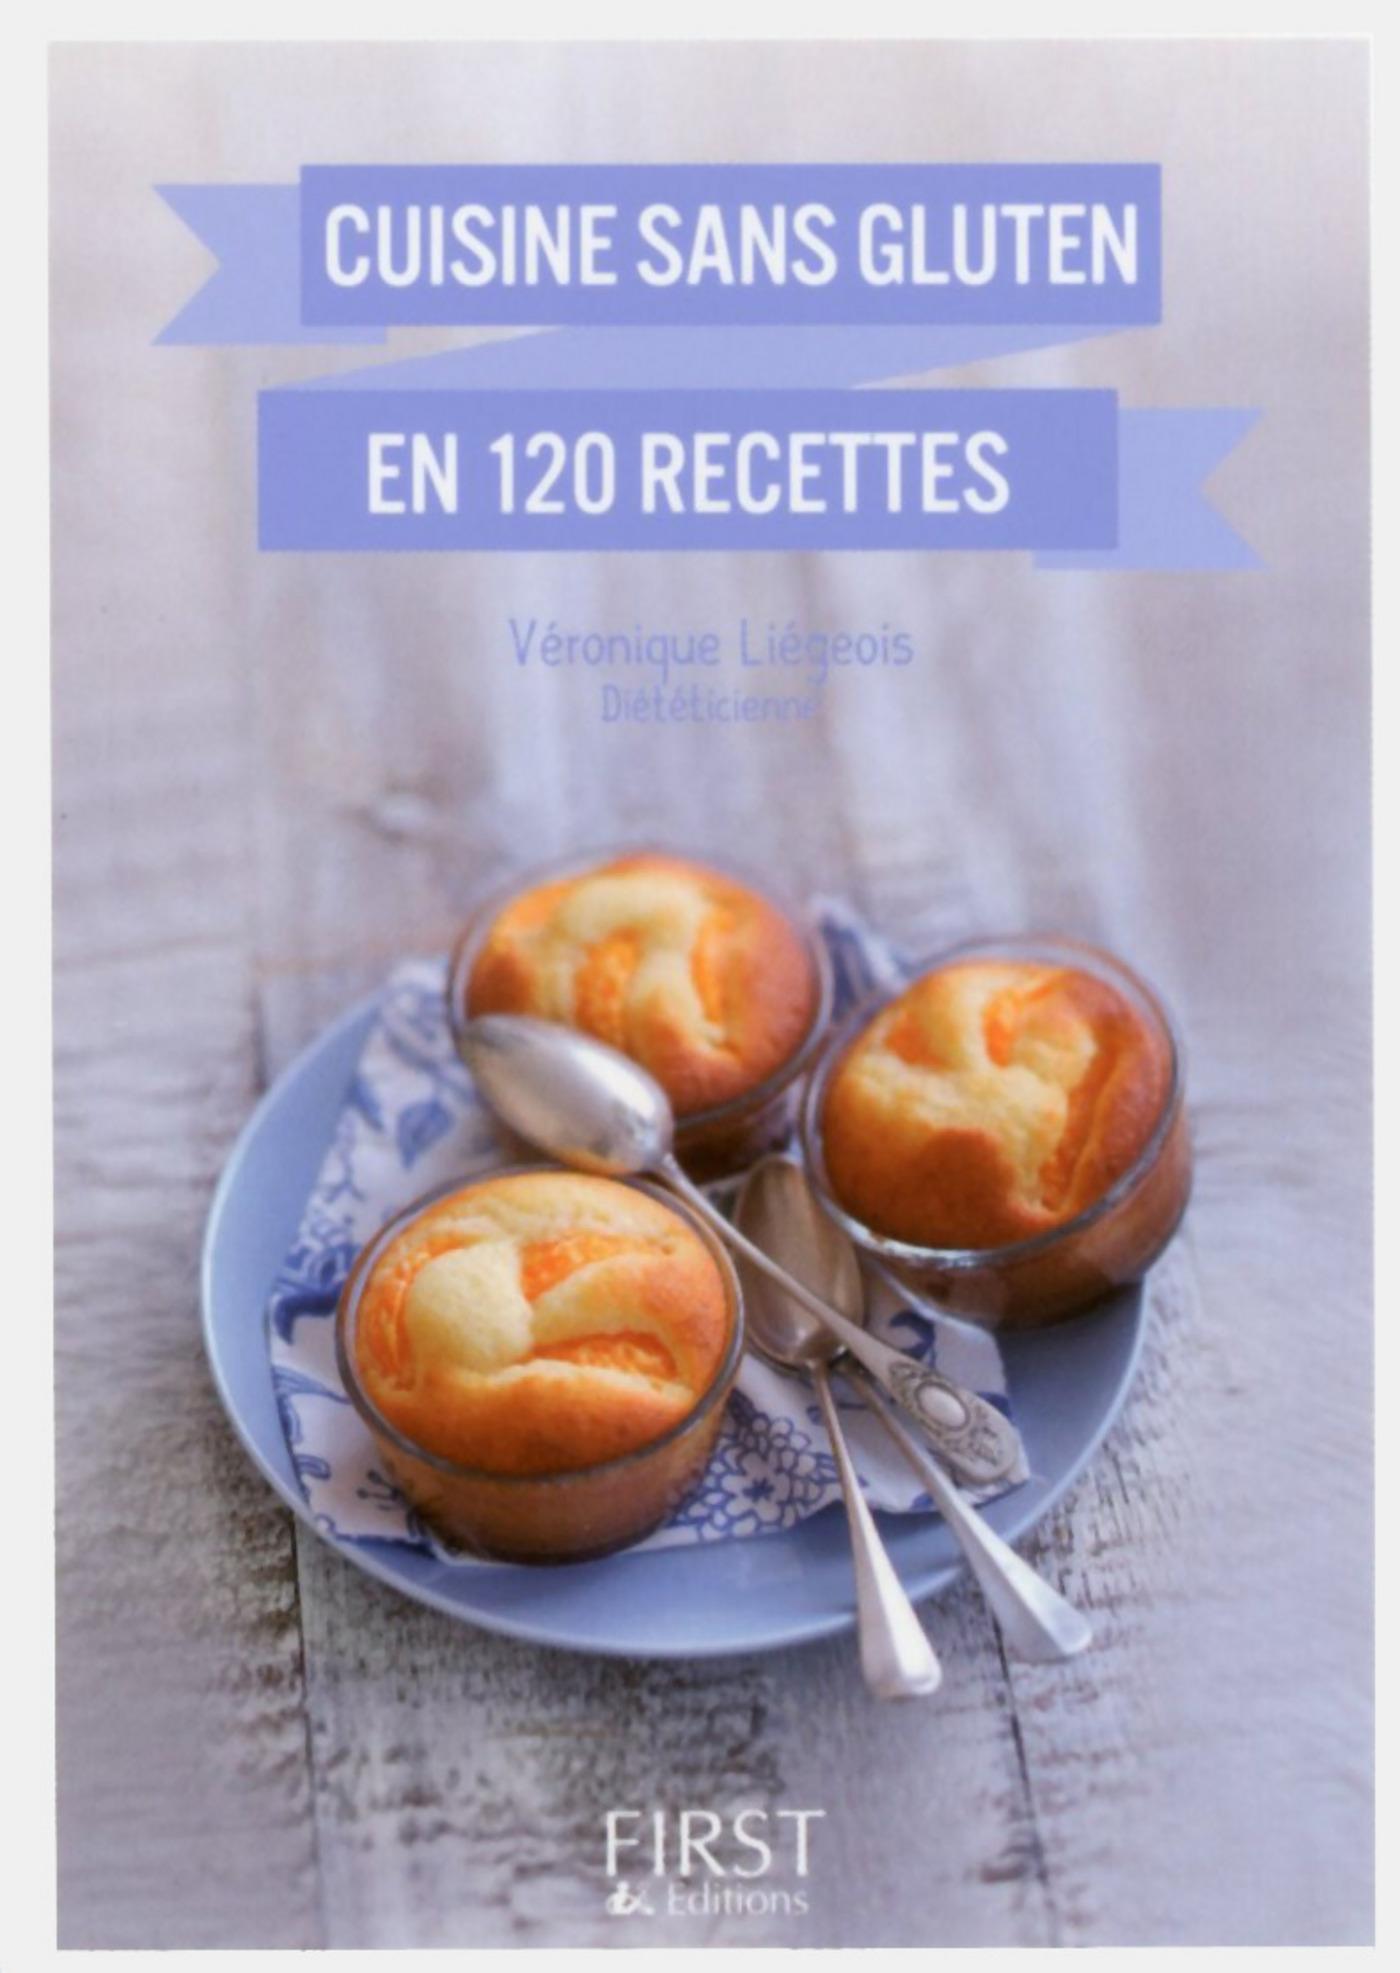 petit livre de cuisine sans gluten en 120 recettes ebook ebooks el corte ingl s. Black Bedroom Furniture Sets. Home Design Ideas